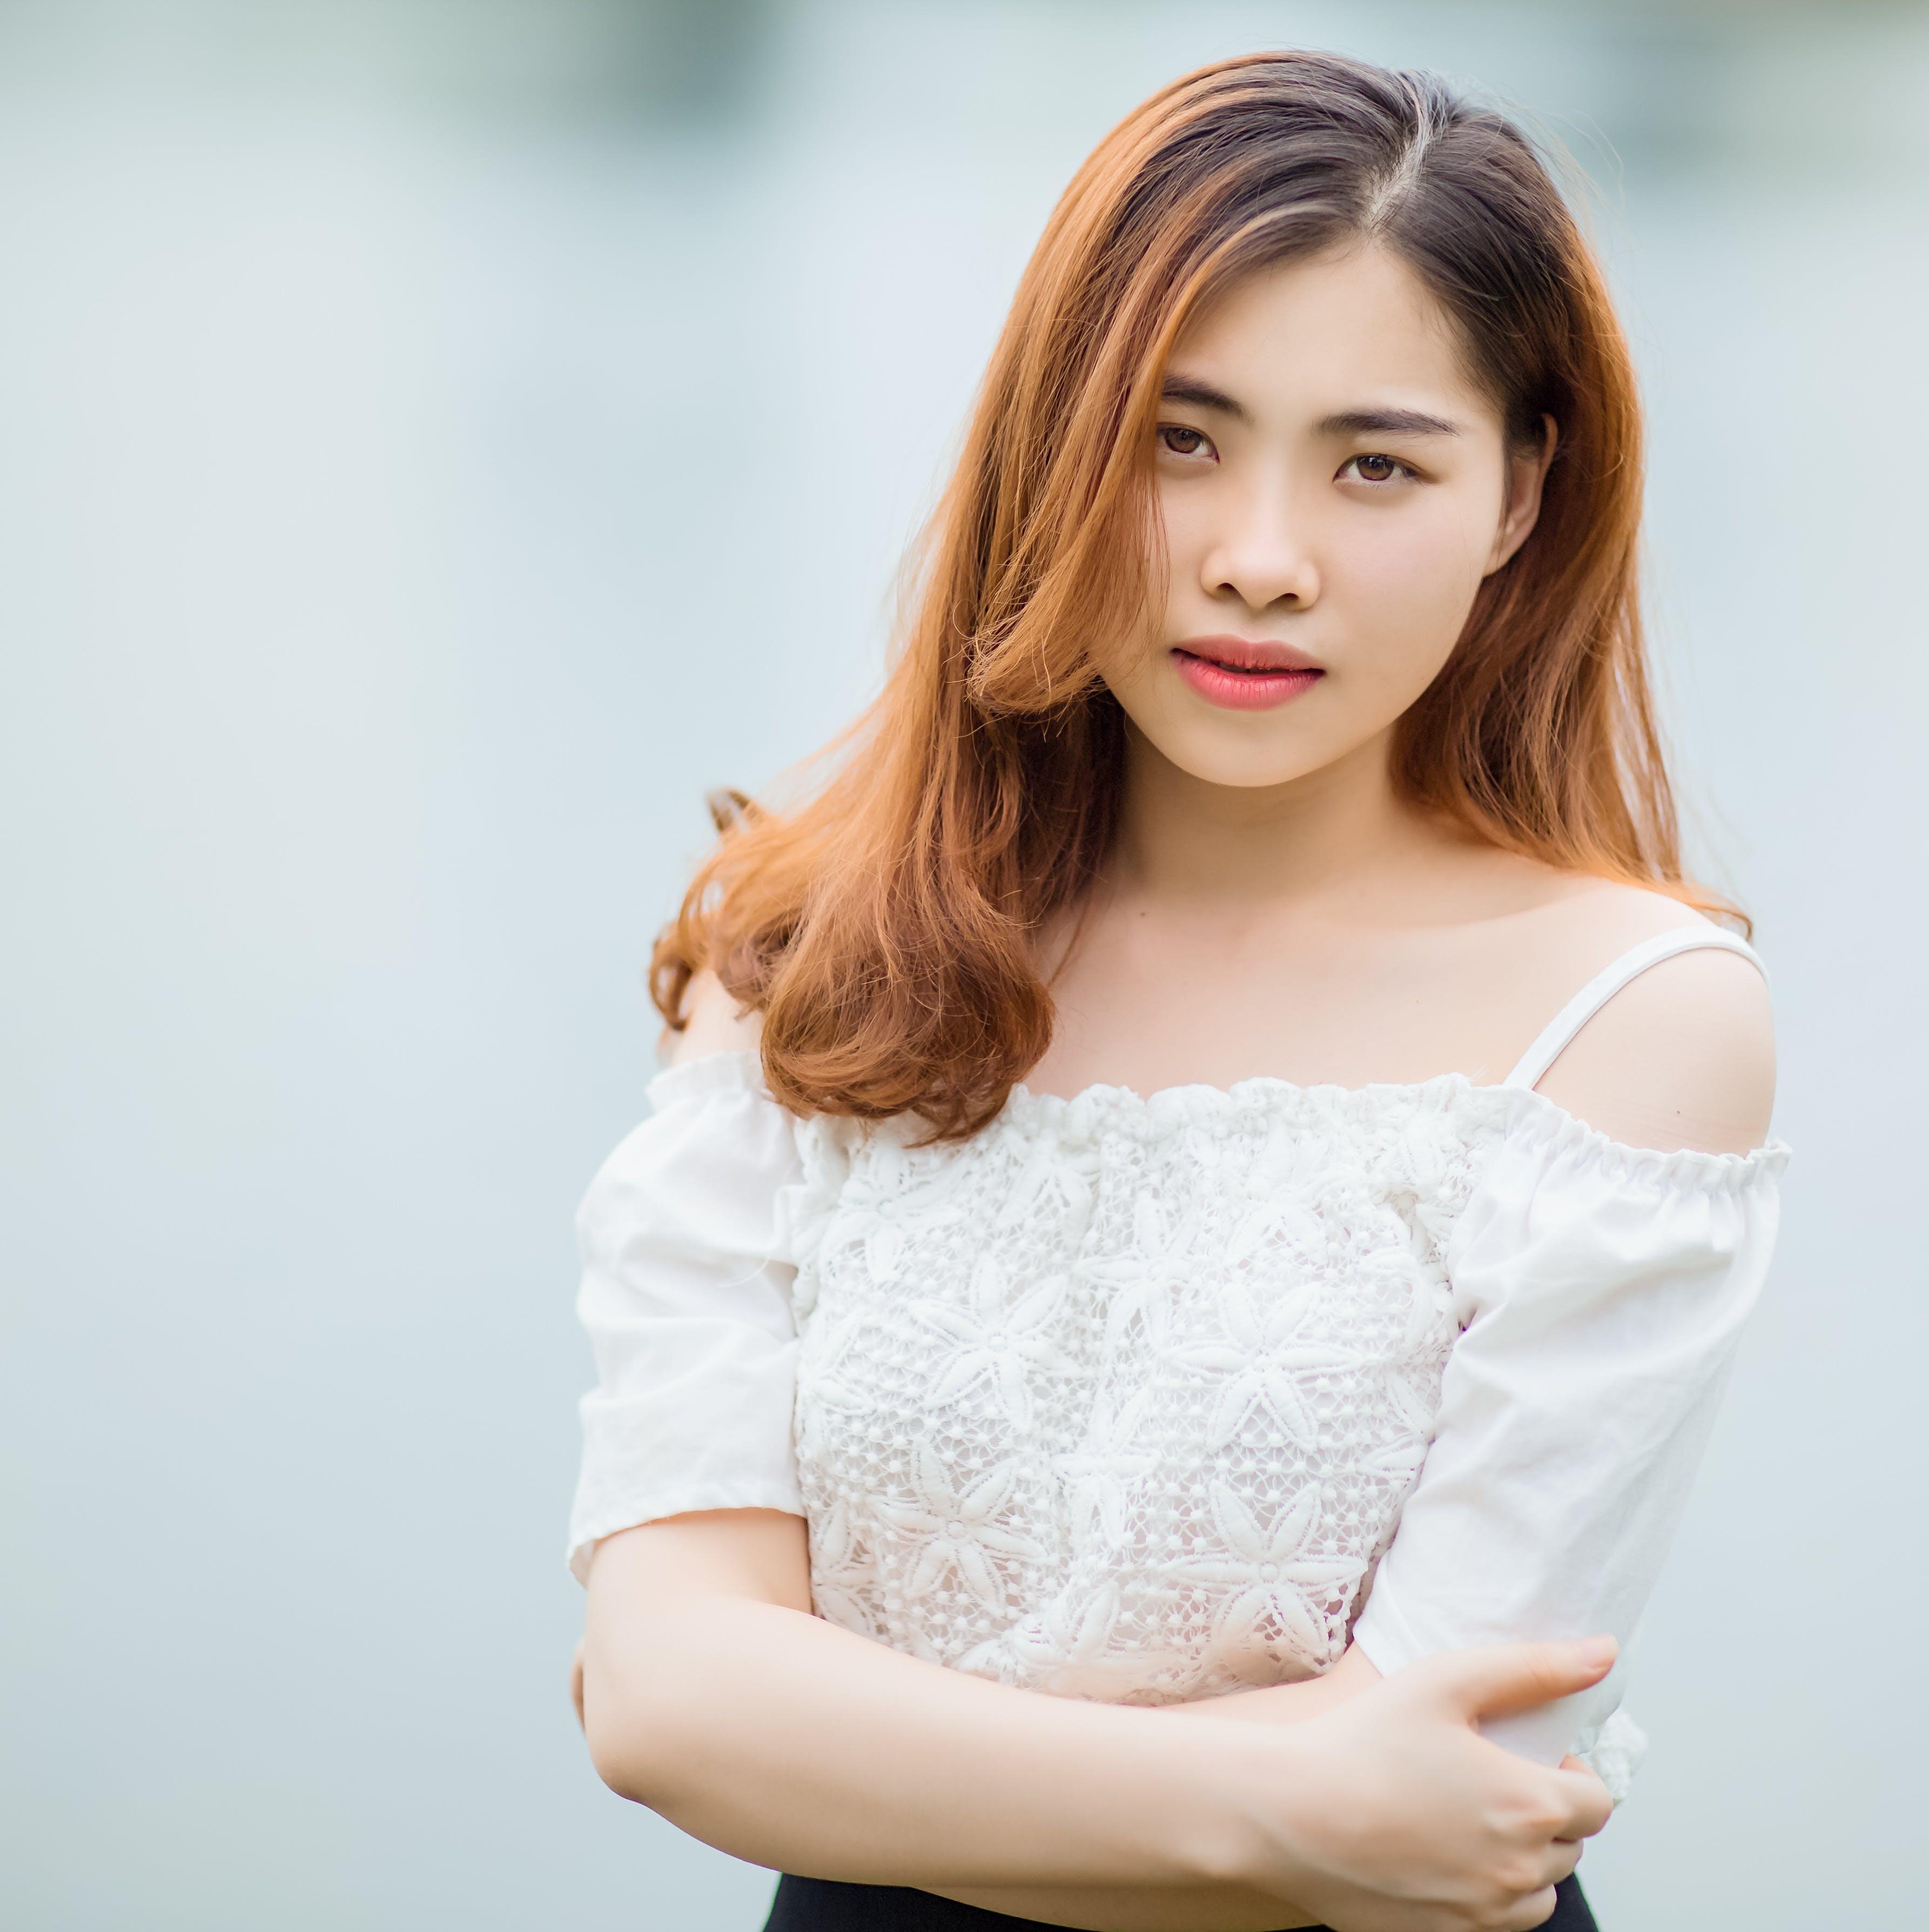 Woman Posing Outdoor